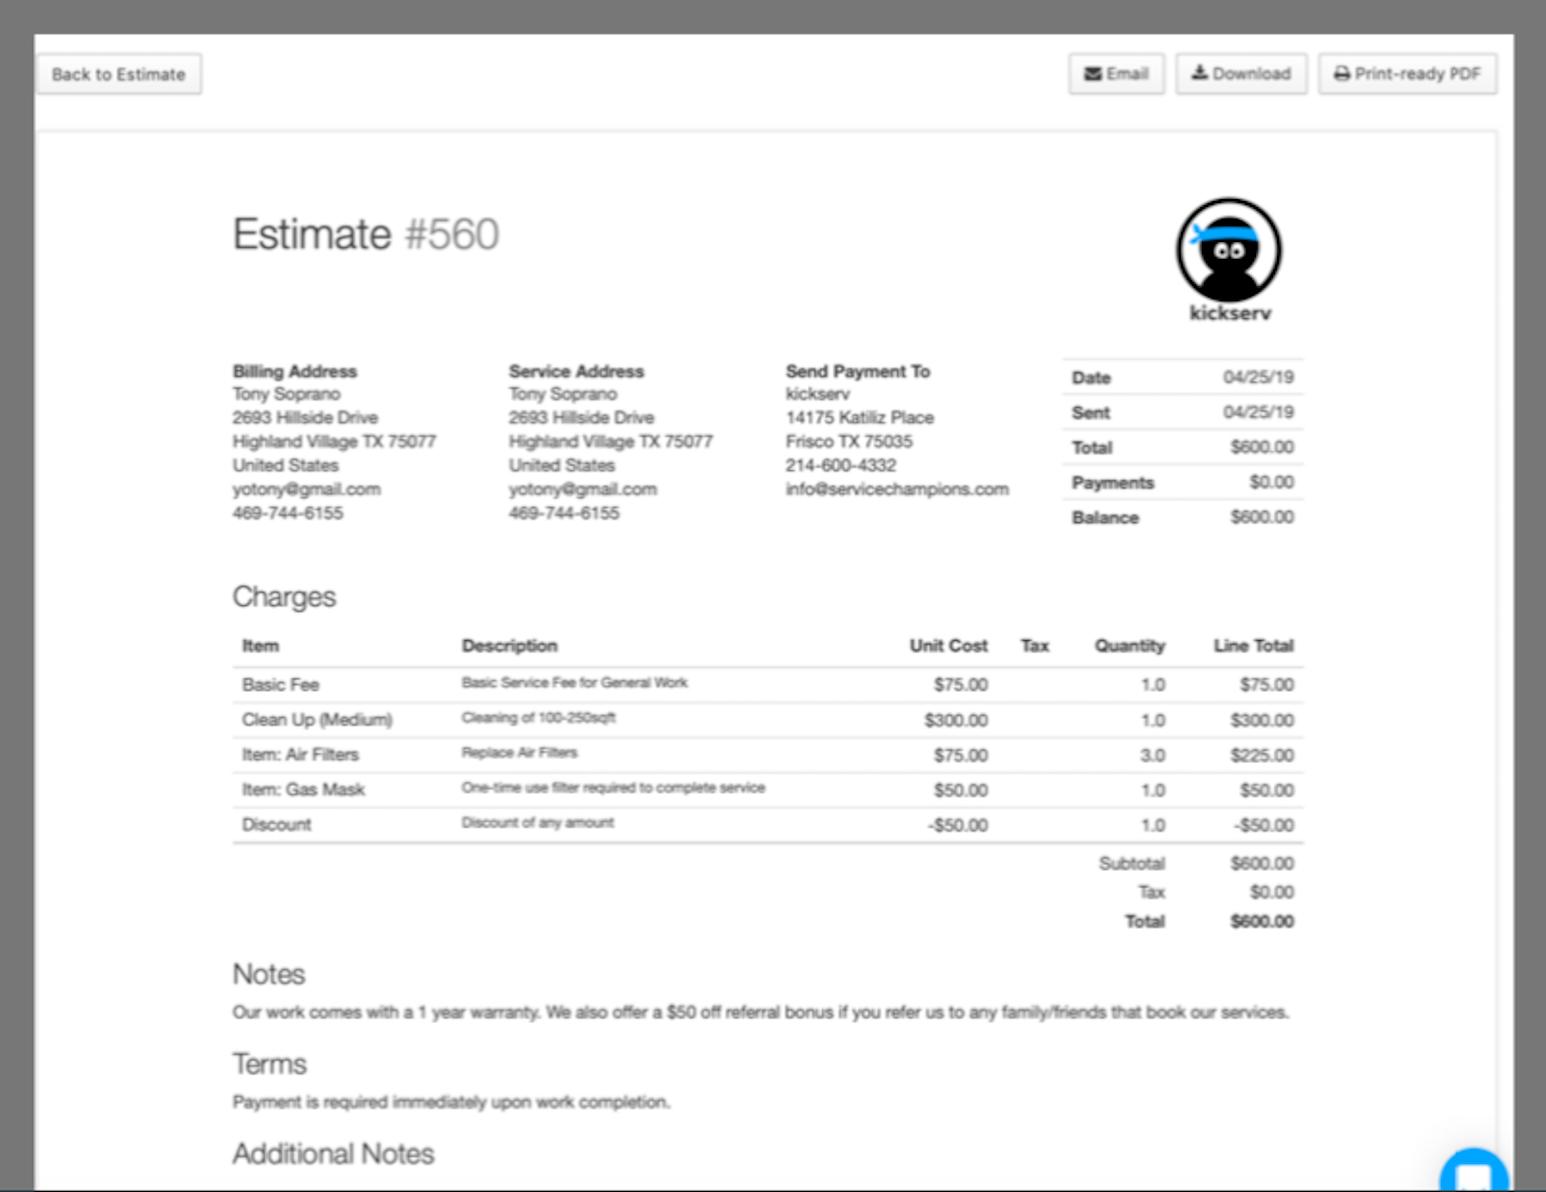 Kickserv Software - Estimates